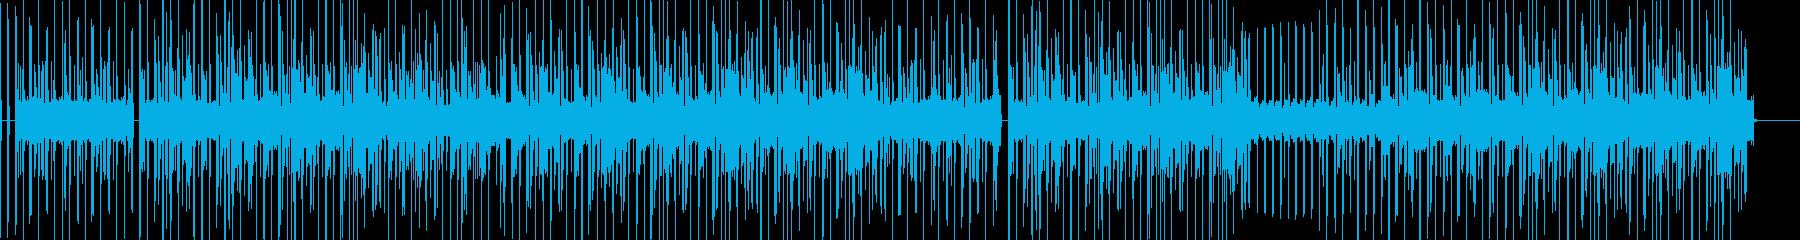 Lo-fi Hip Hopの再生済みの波形